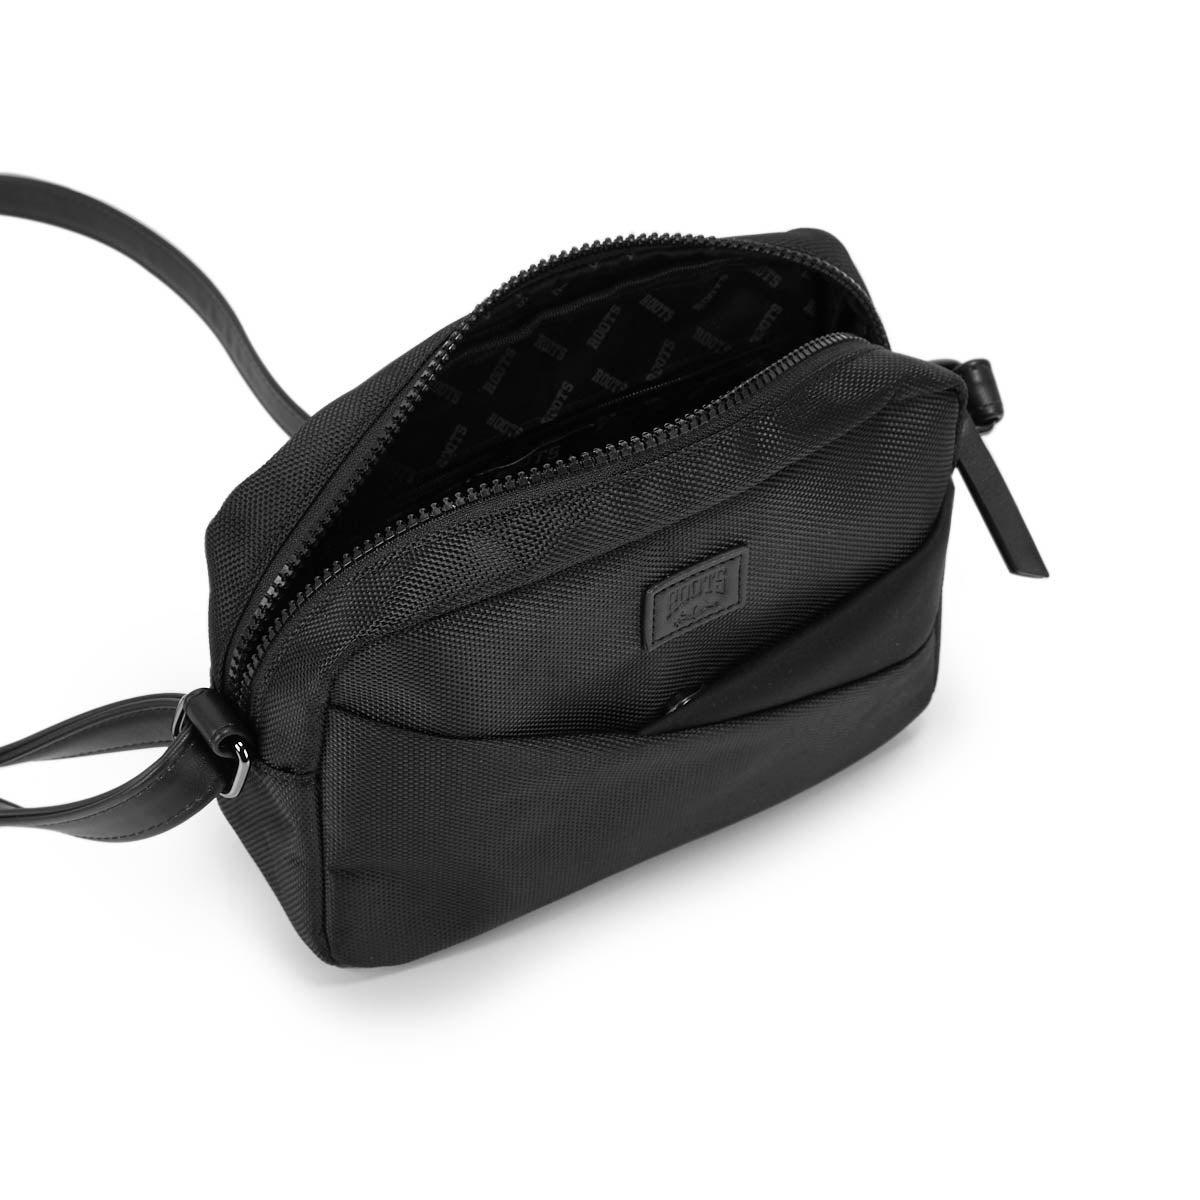 Lds Roots73 black crossbody camera bag